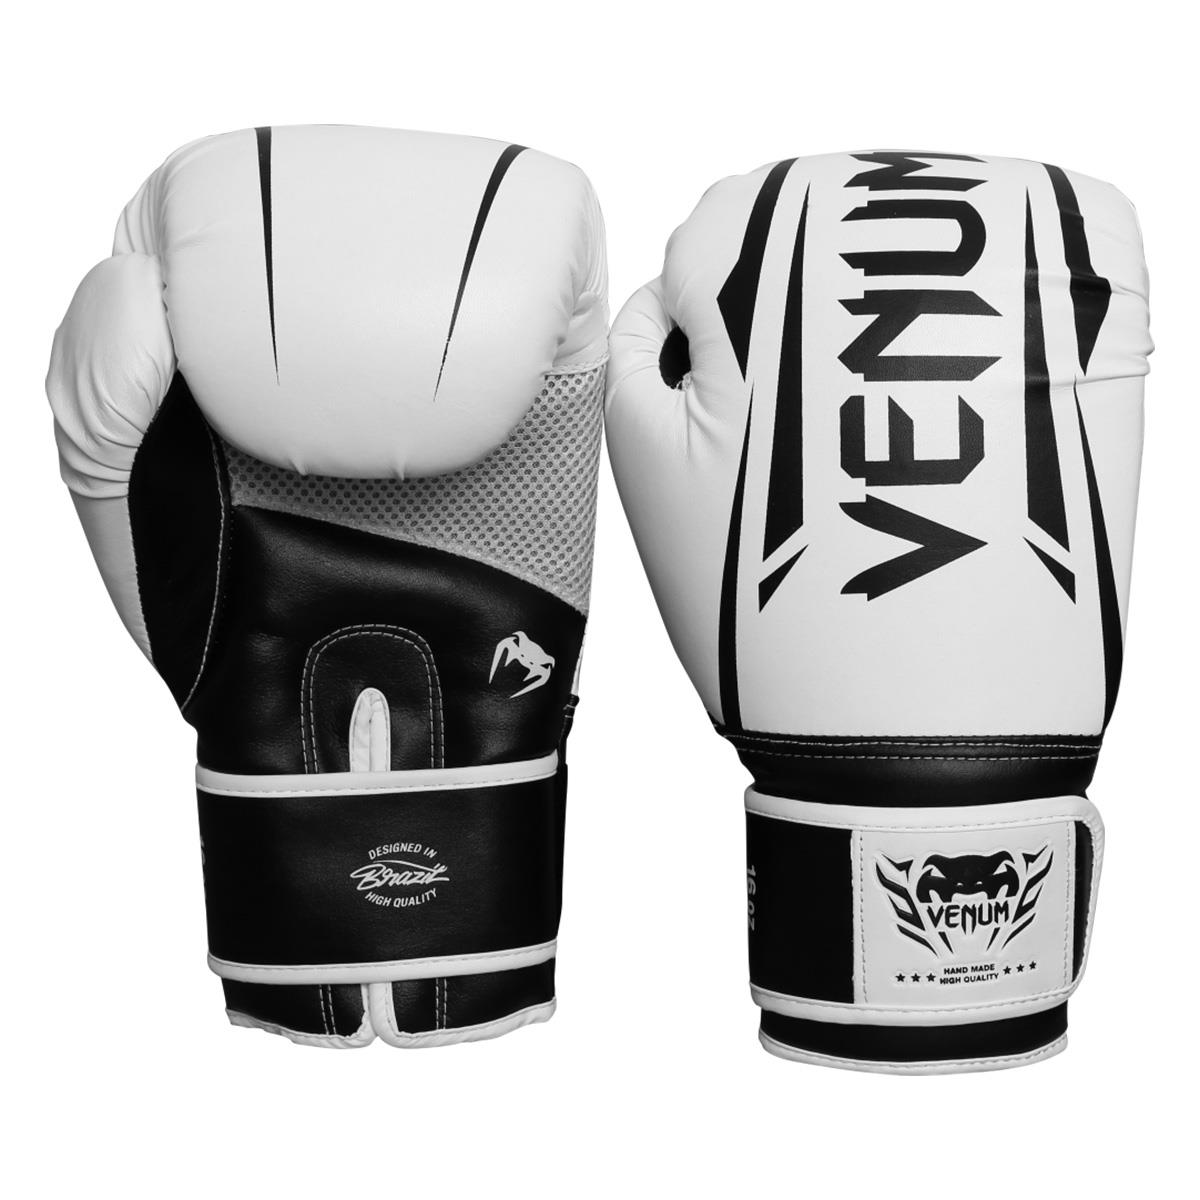 a1f0ec54f2 Luvas De Boxe E Muay Thai Venum New Elite Branca na Estrela10